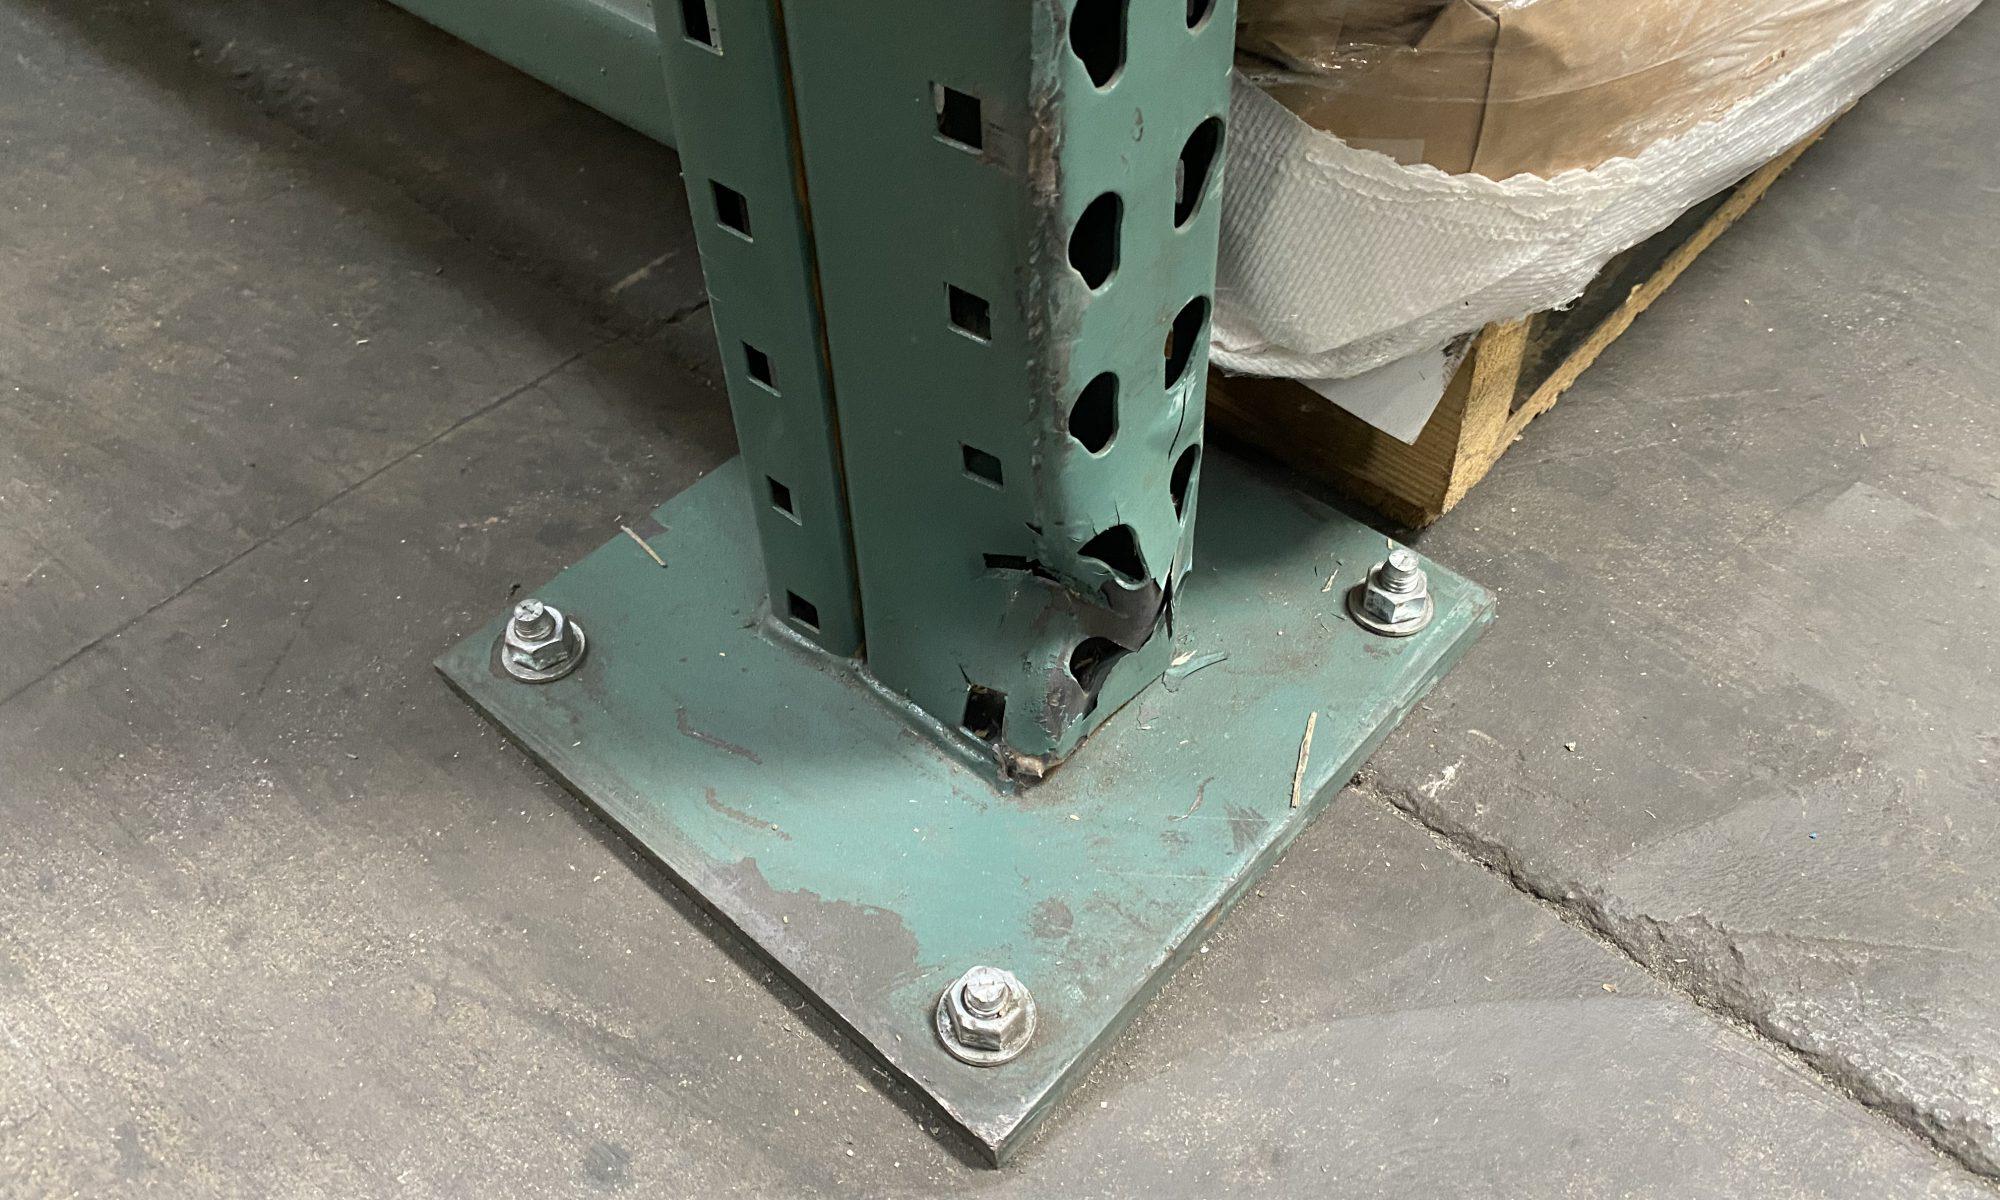 Damaged racking prior to pallet rack repair service